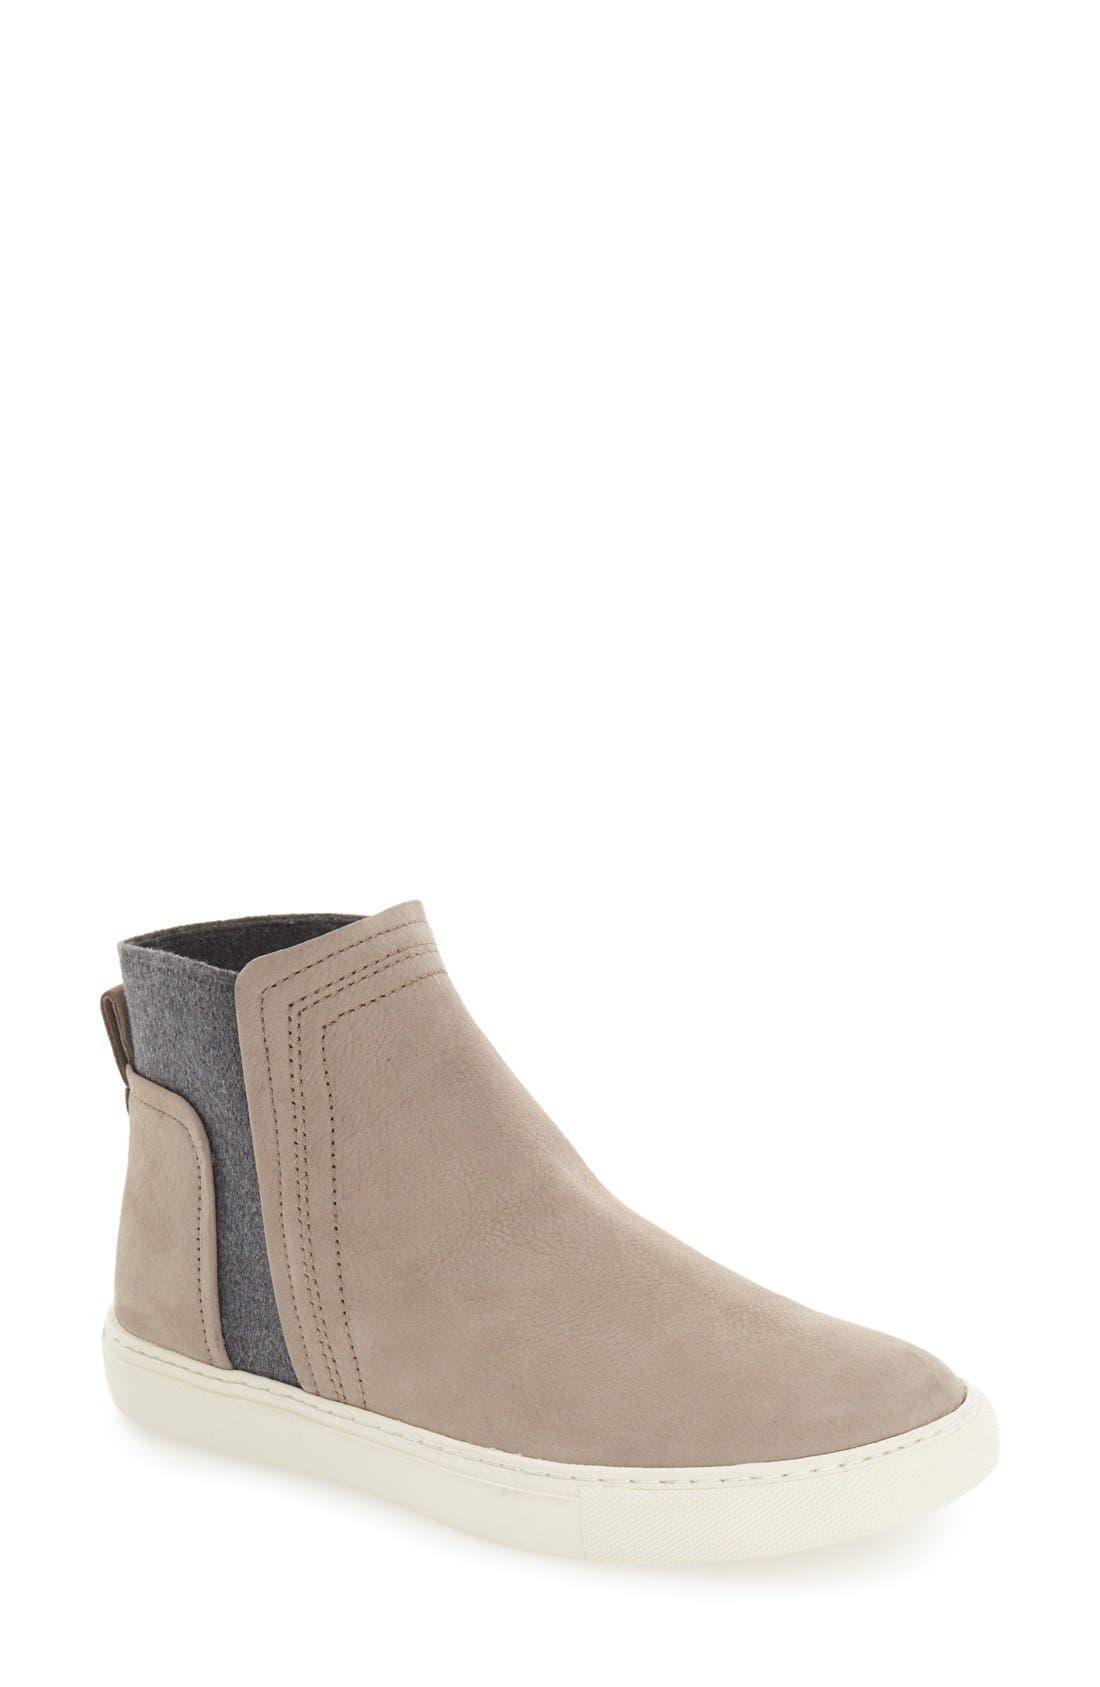 Main Image - Kenneth Cole New York 'Ken' Leather Slip-On Sneaker (Women)